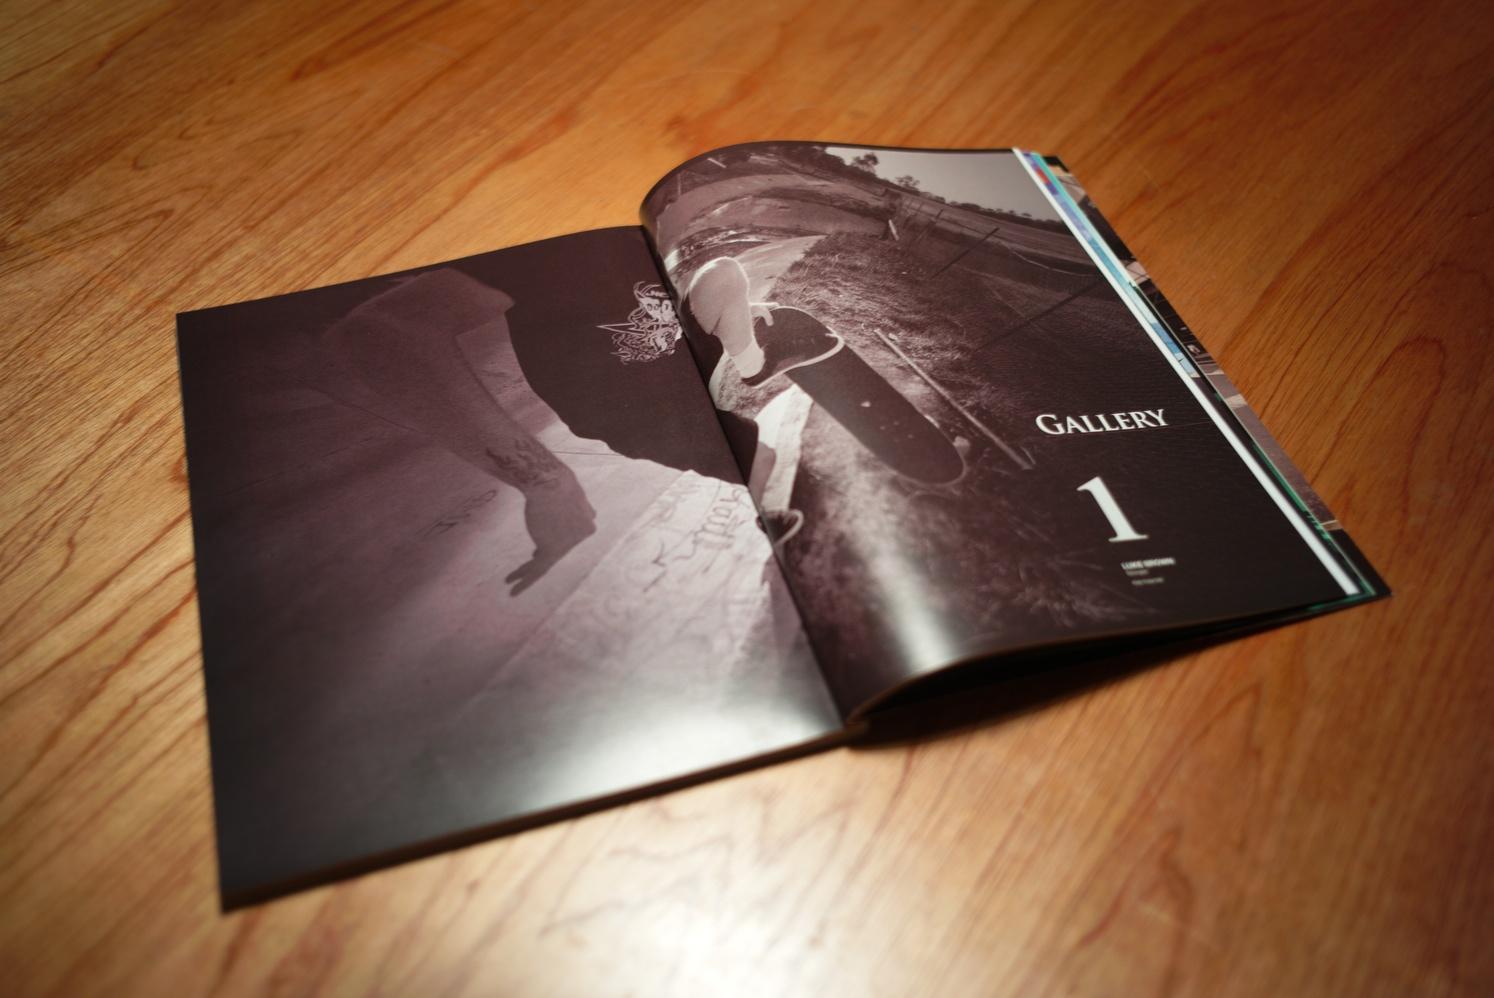 Tristan_Still_The_Skateboarders_Journal_Issue_8_Gallery_Feature_Image_Luke_Brown_Spence_Drain.jpg